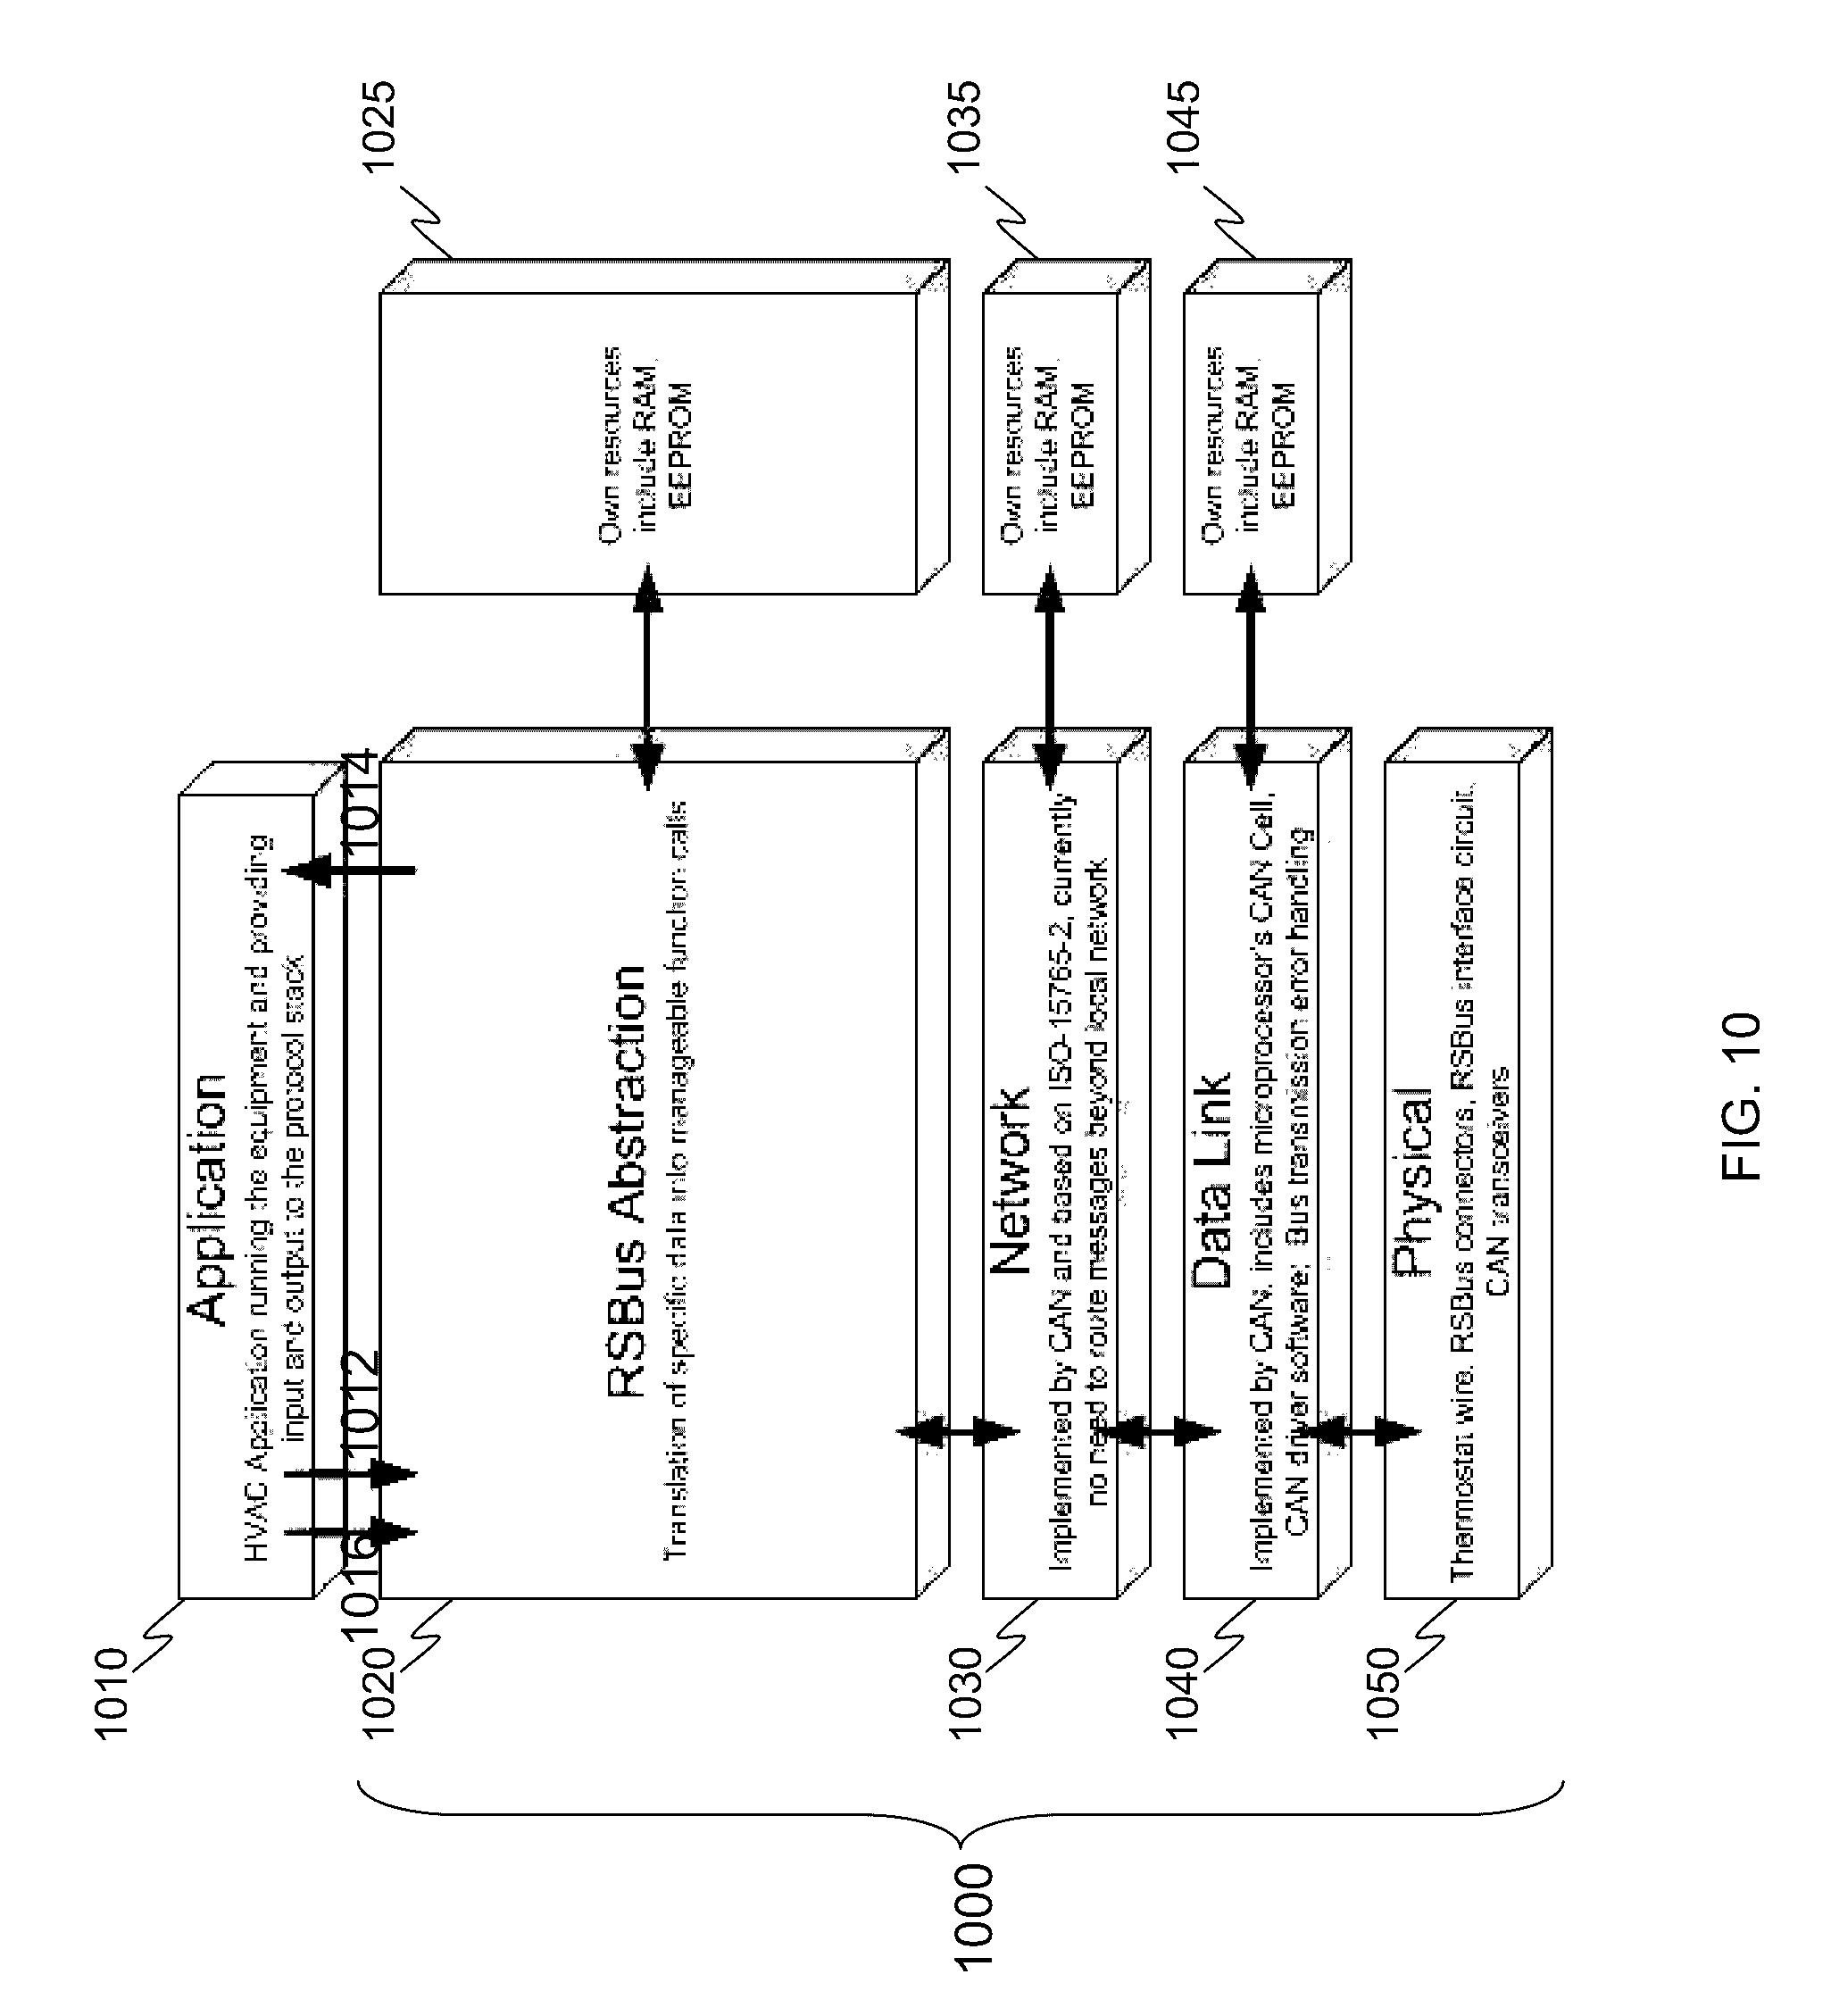 Wiring Diagram Moreover Vav Hvac System Diagram On Wiring Diagram For